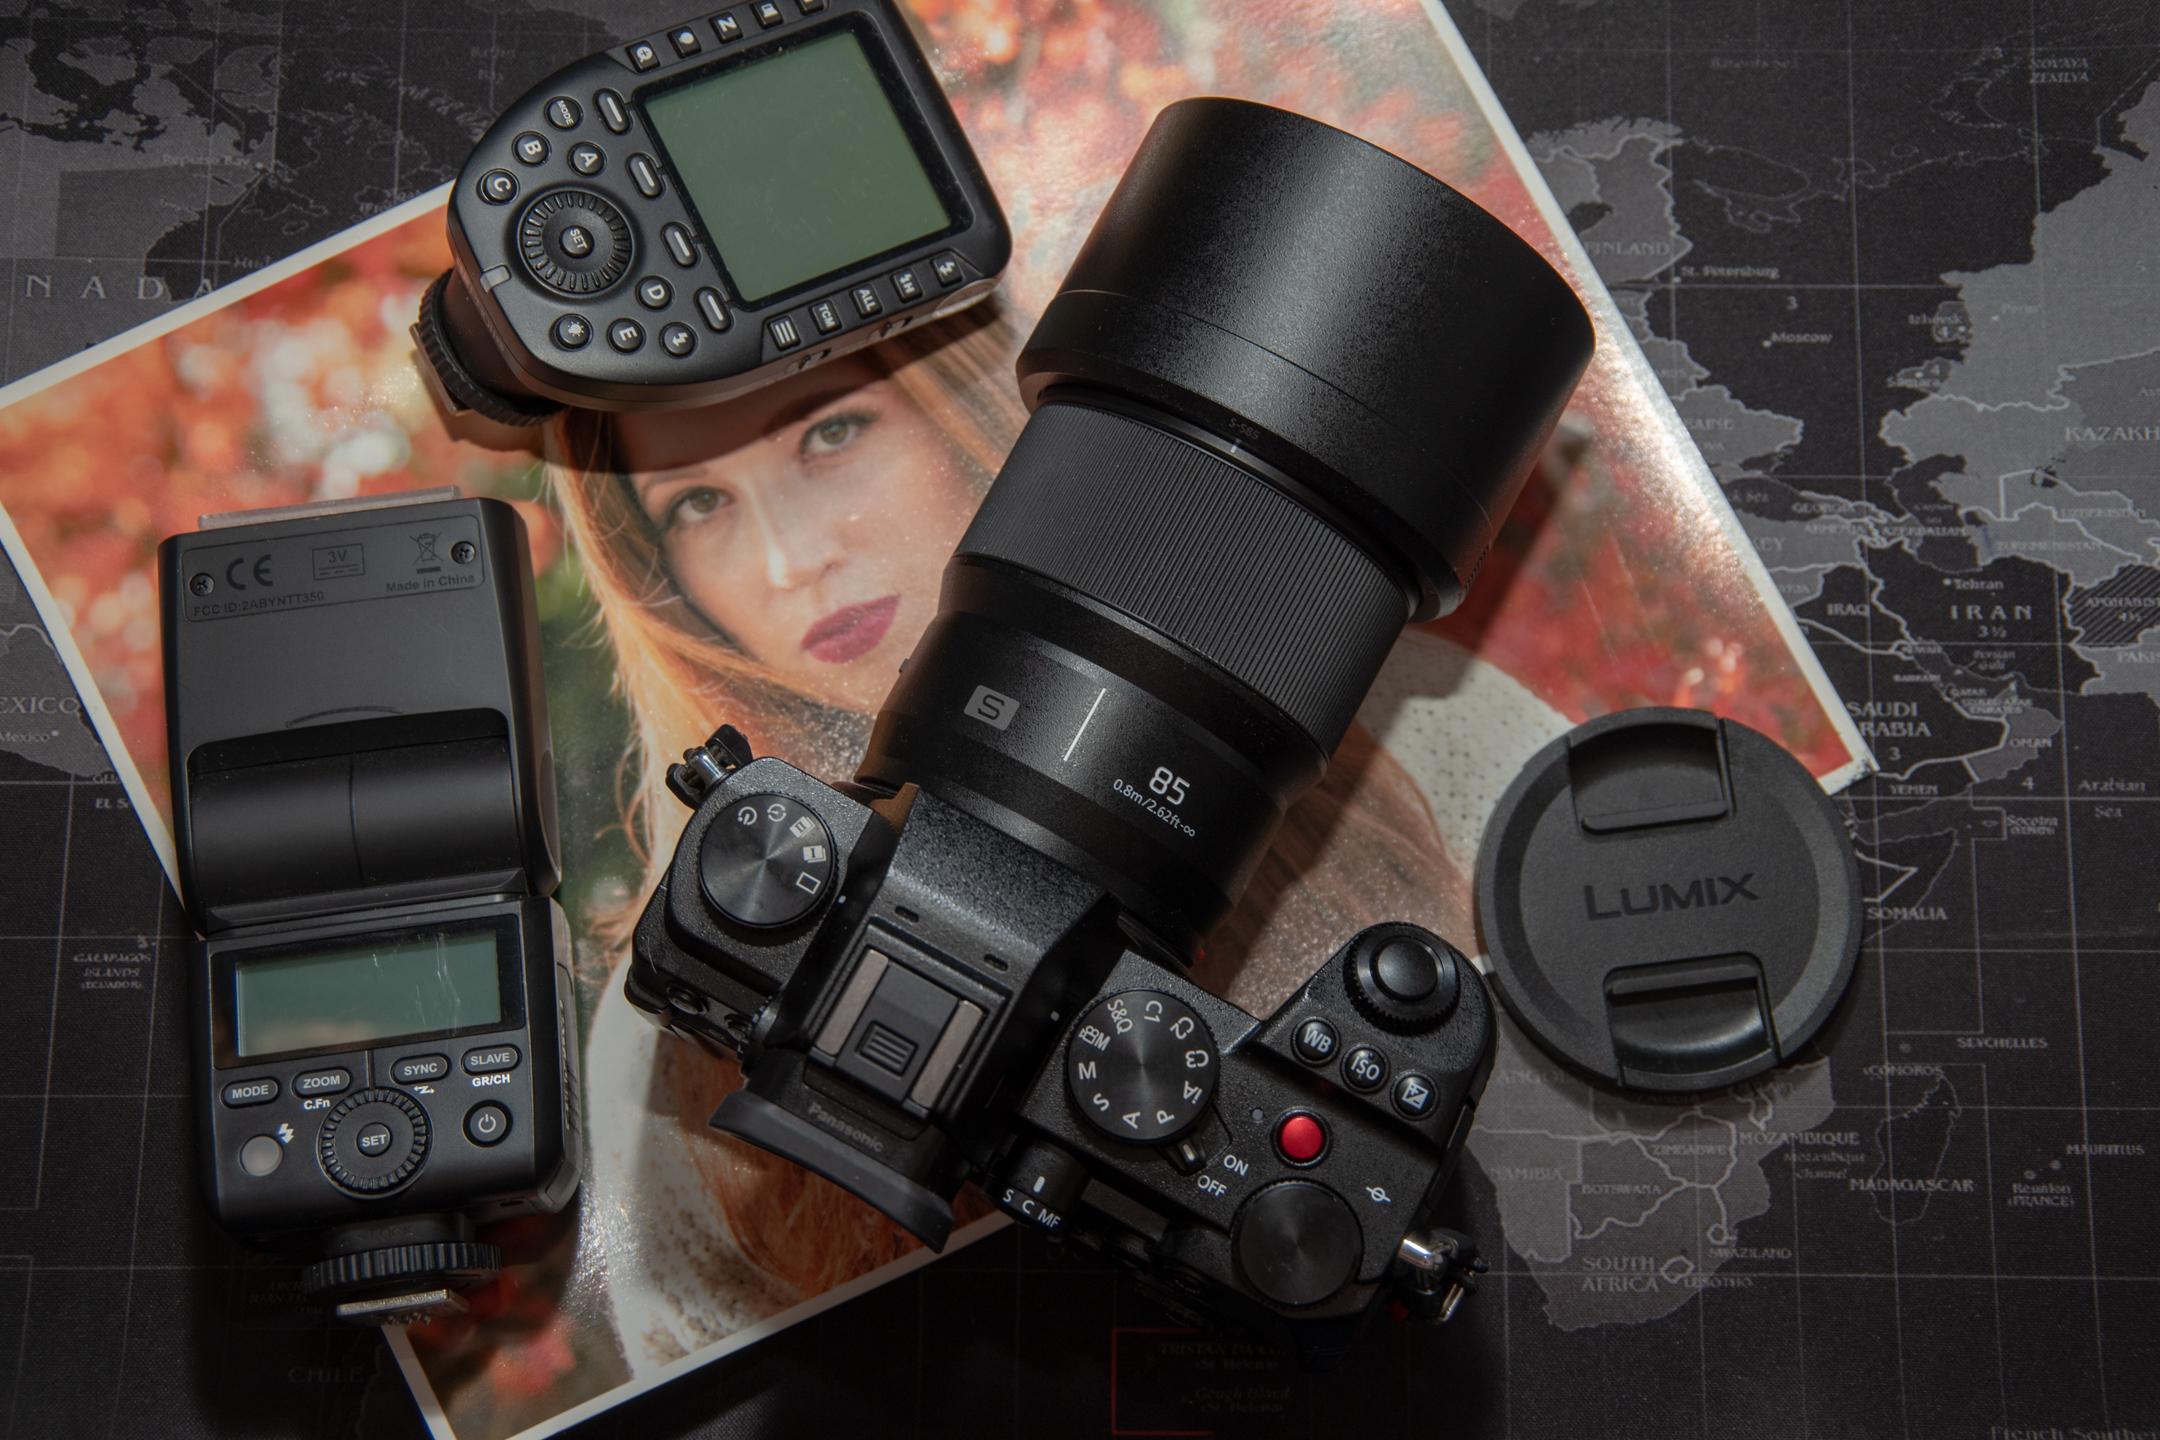 Brett Day Panasonic Lumix 85mm f1.8